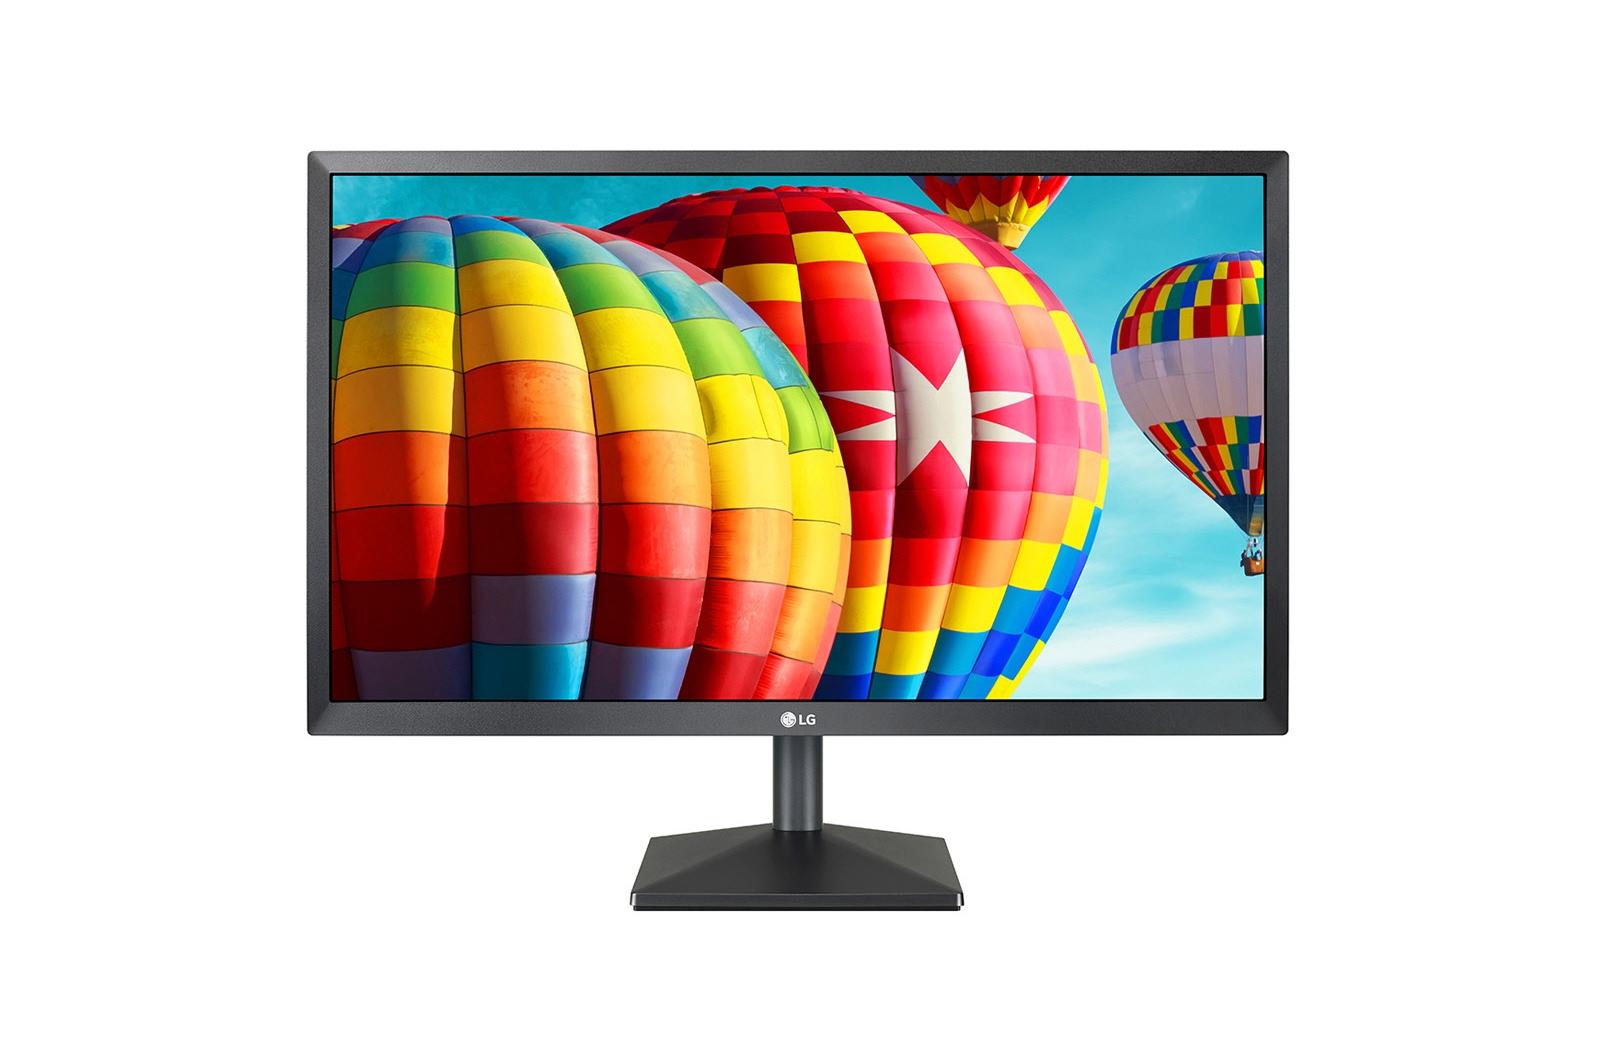 "LG 24MK430H computer monitor 60.5 cm (23.8"") Full HD LCD Flat Black"